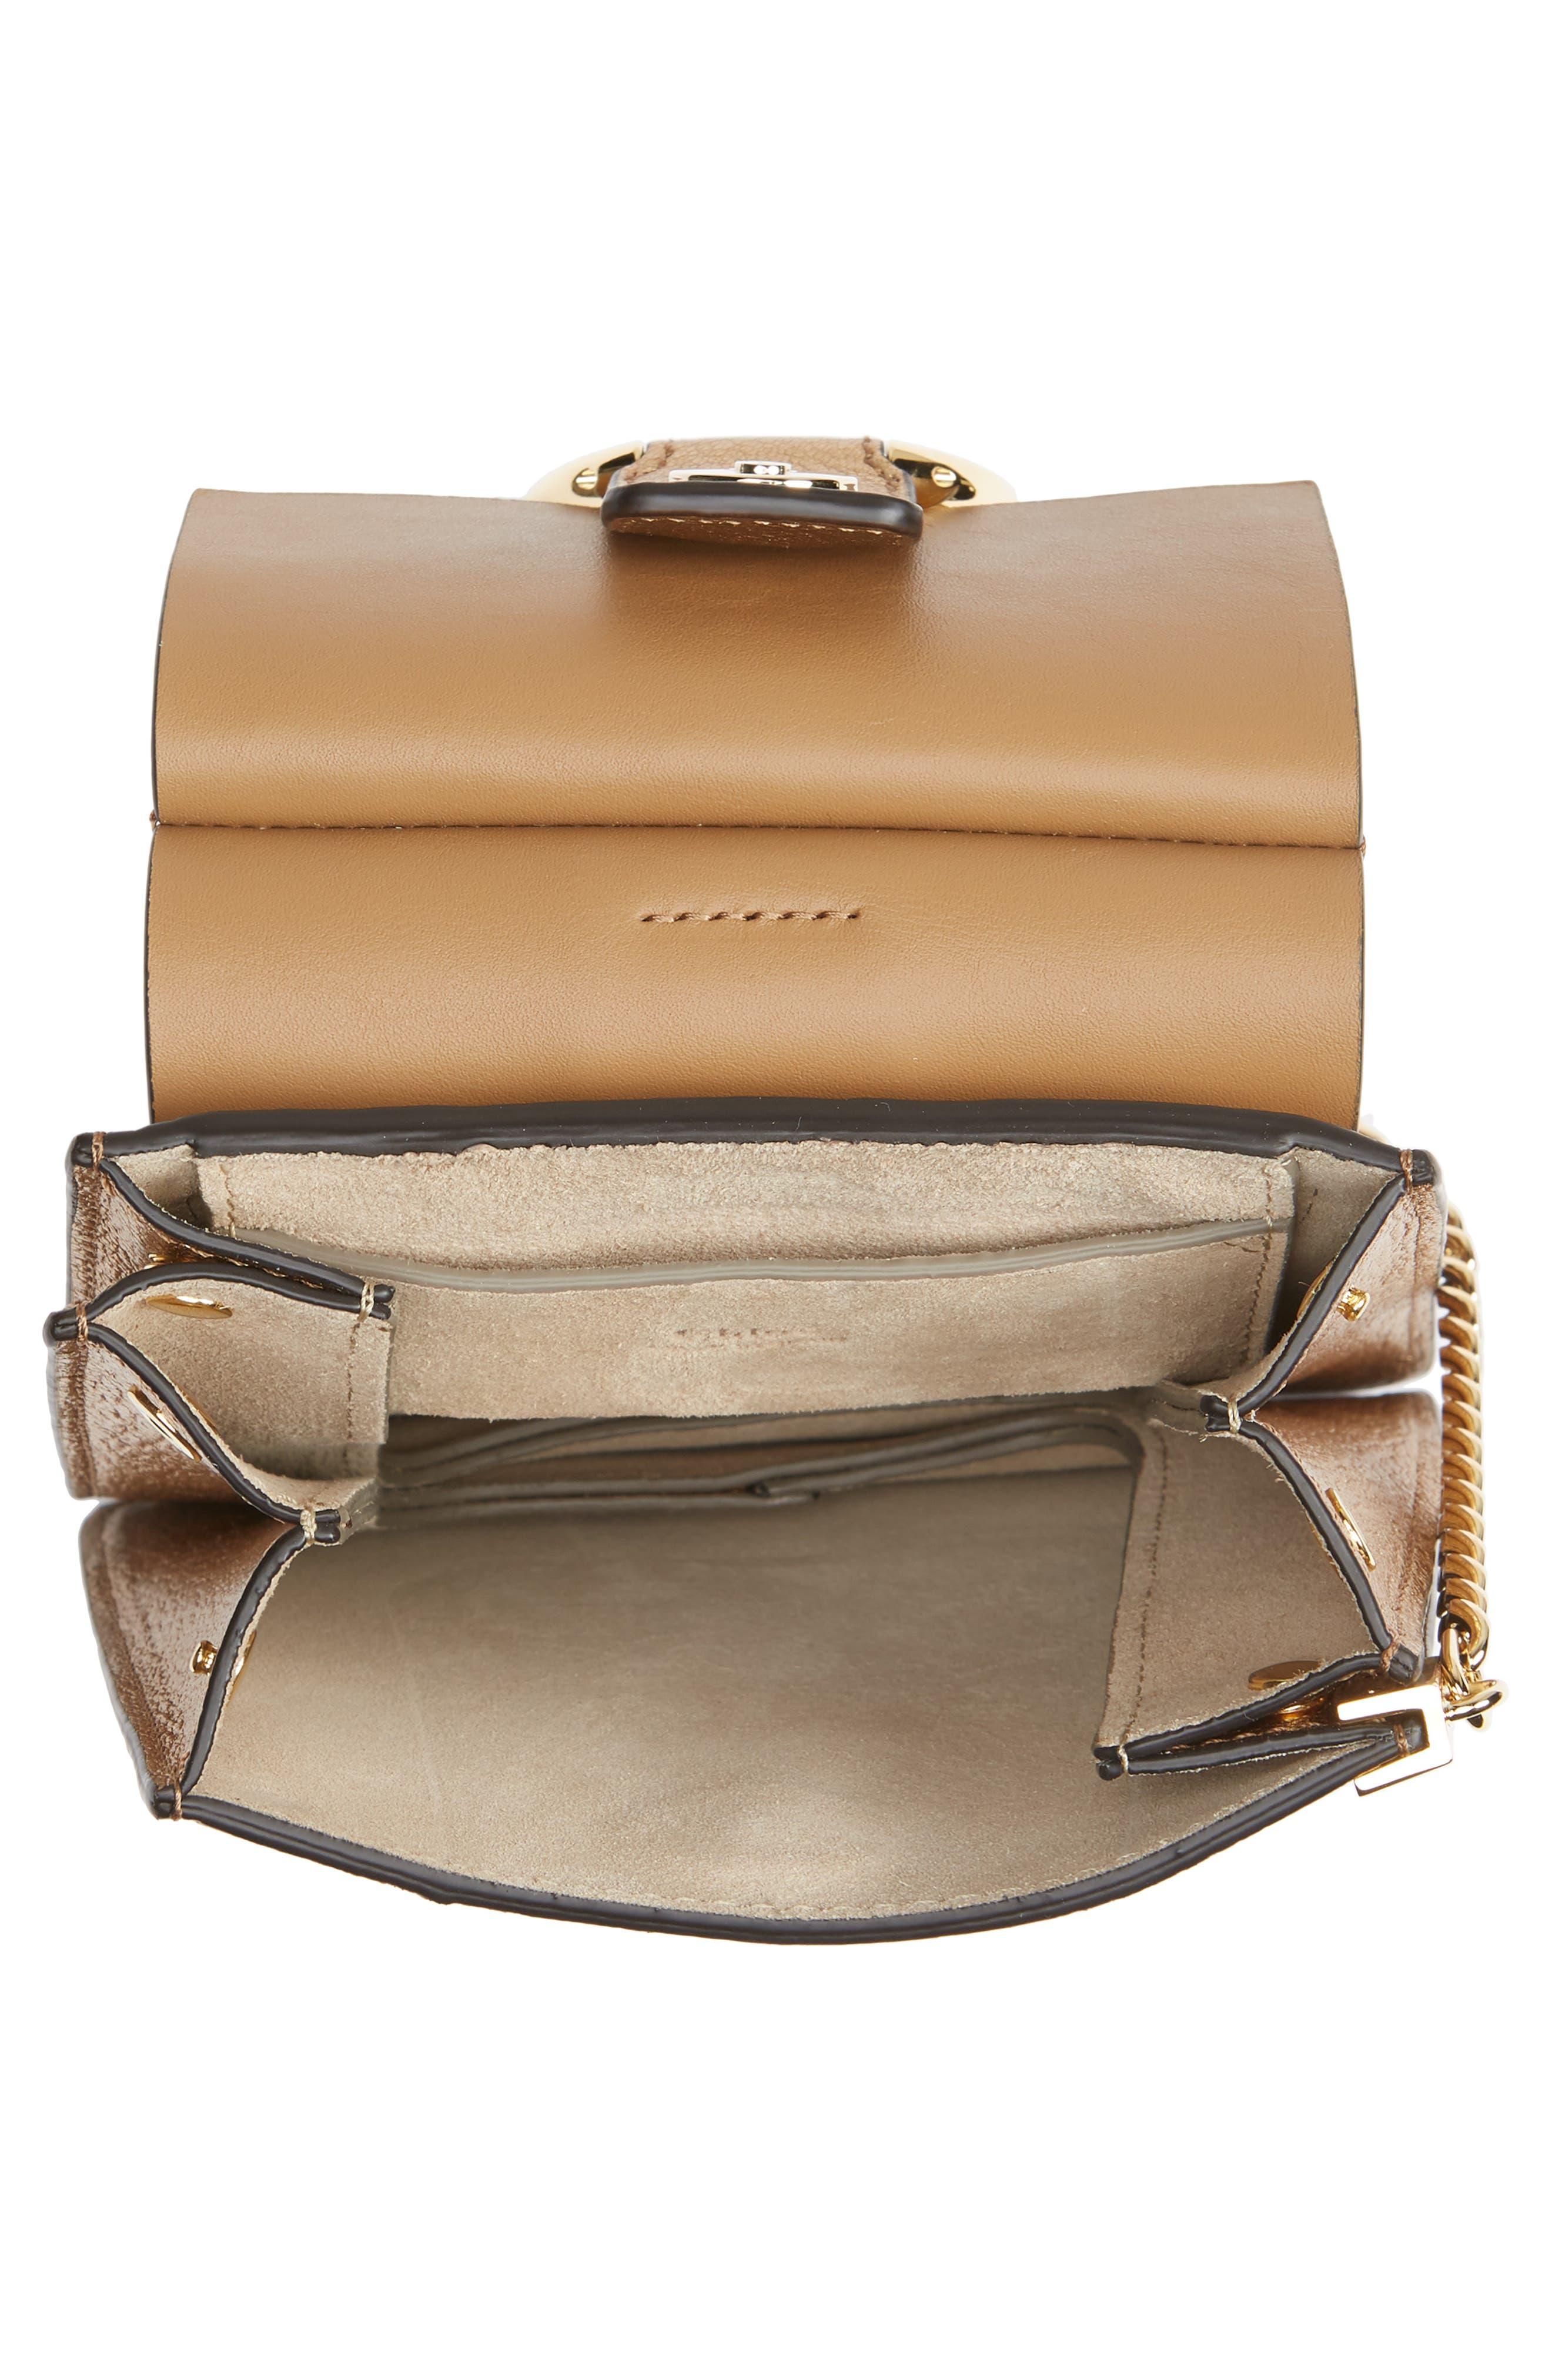 Faye Small Metallic Leather Bracelet Bag,                             Alternate thumbnail 5, color,                             GOLD